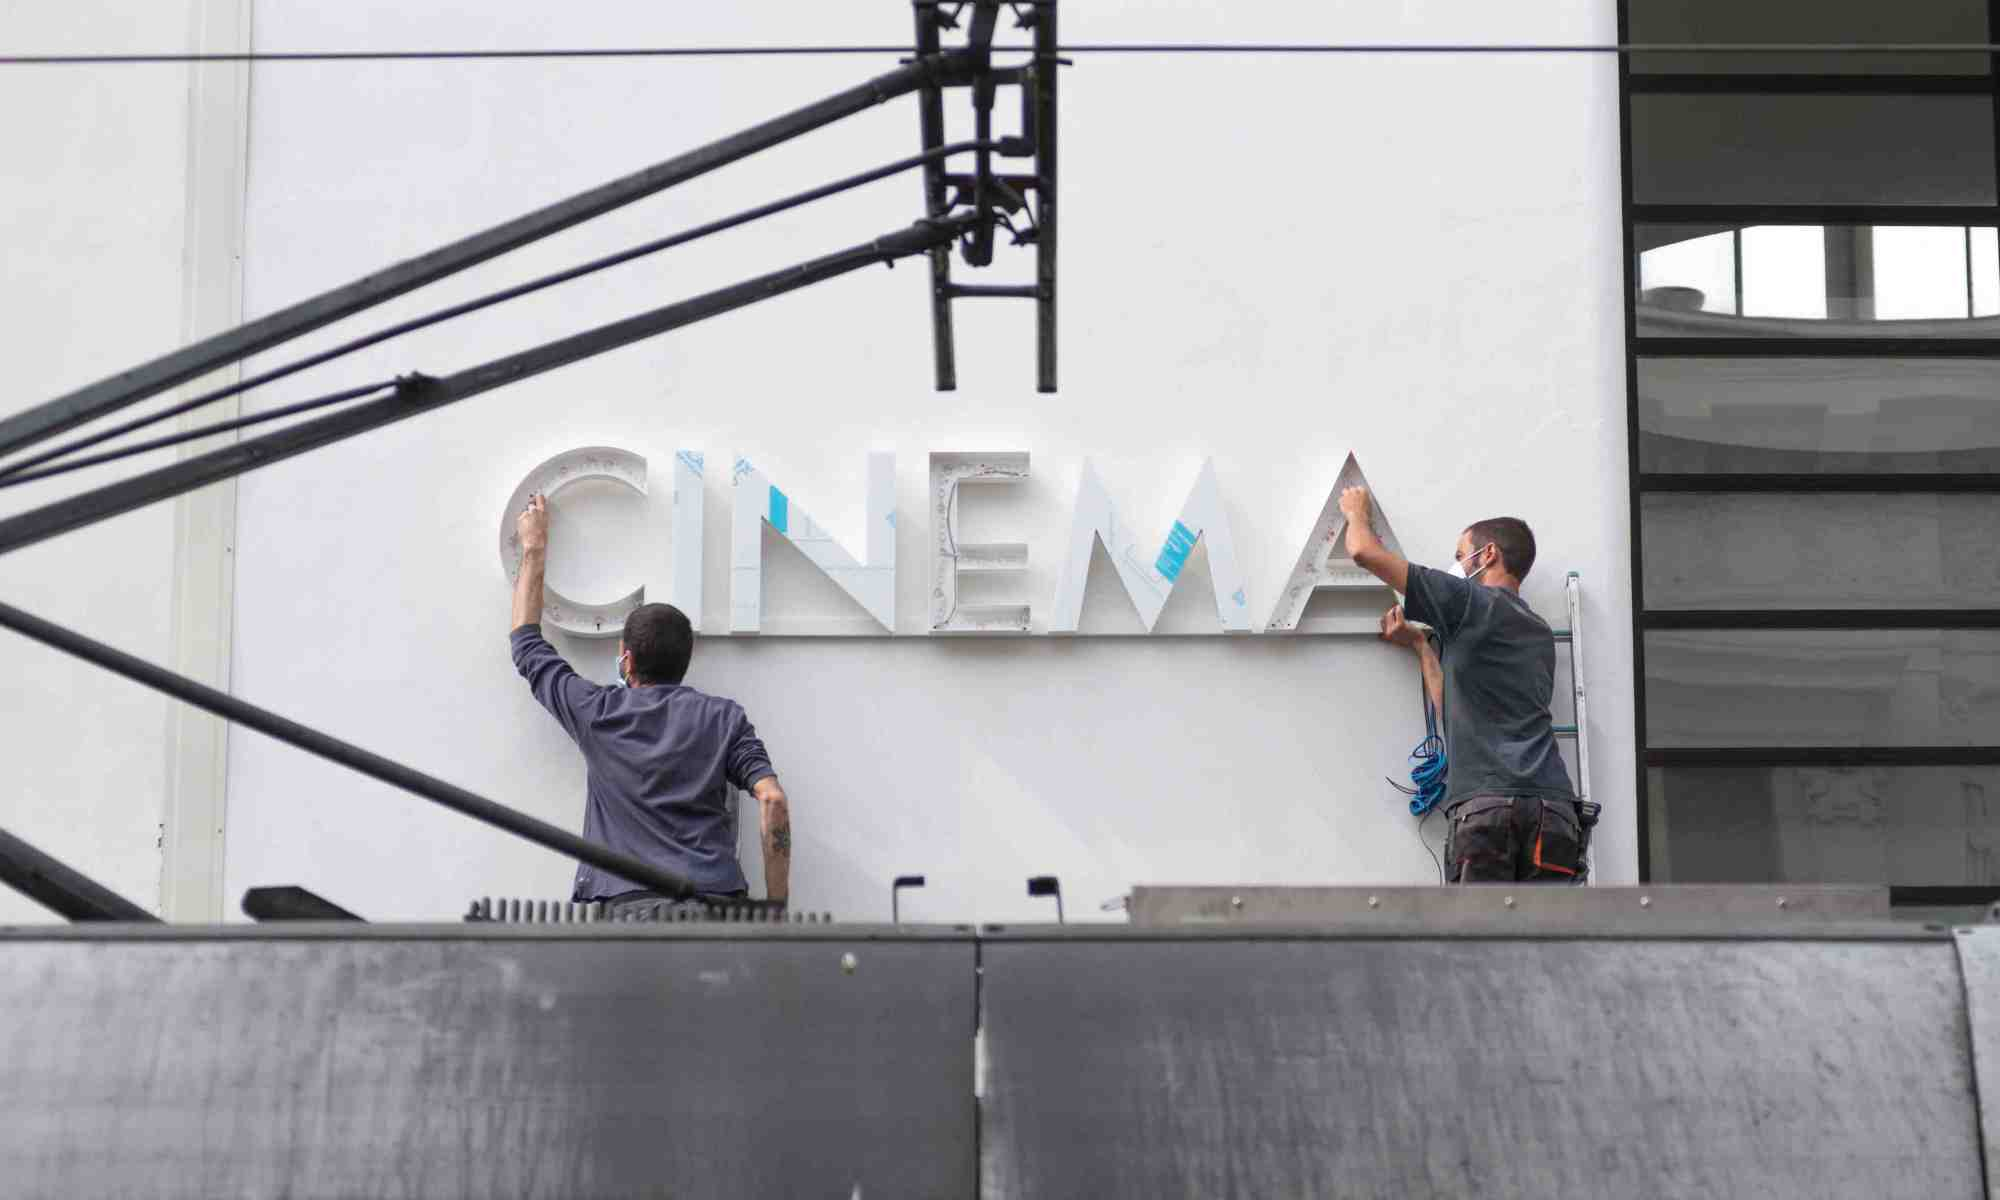 cinema-troisi-roma-trastevere-ragazzi